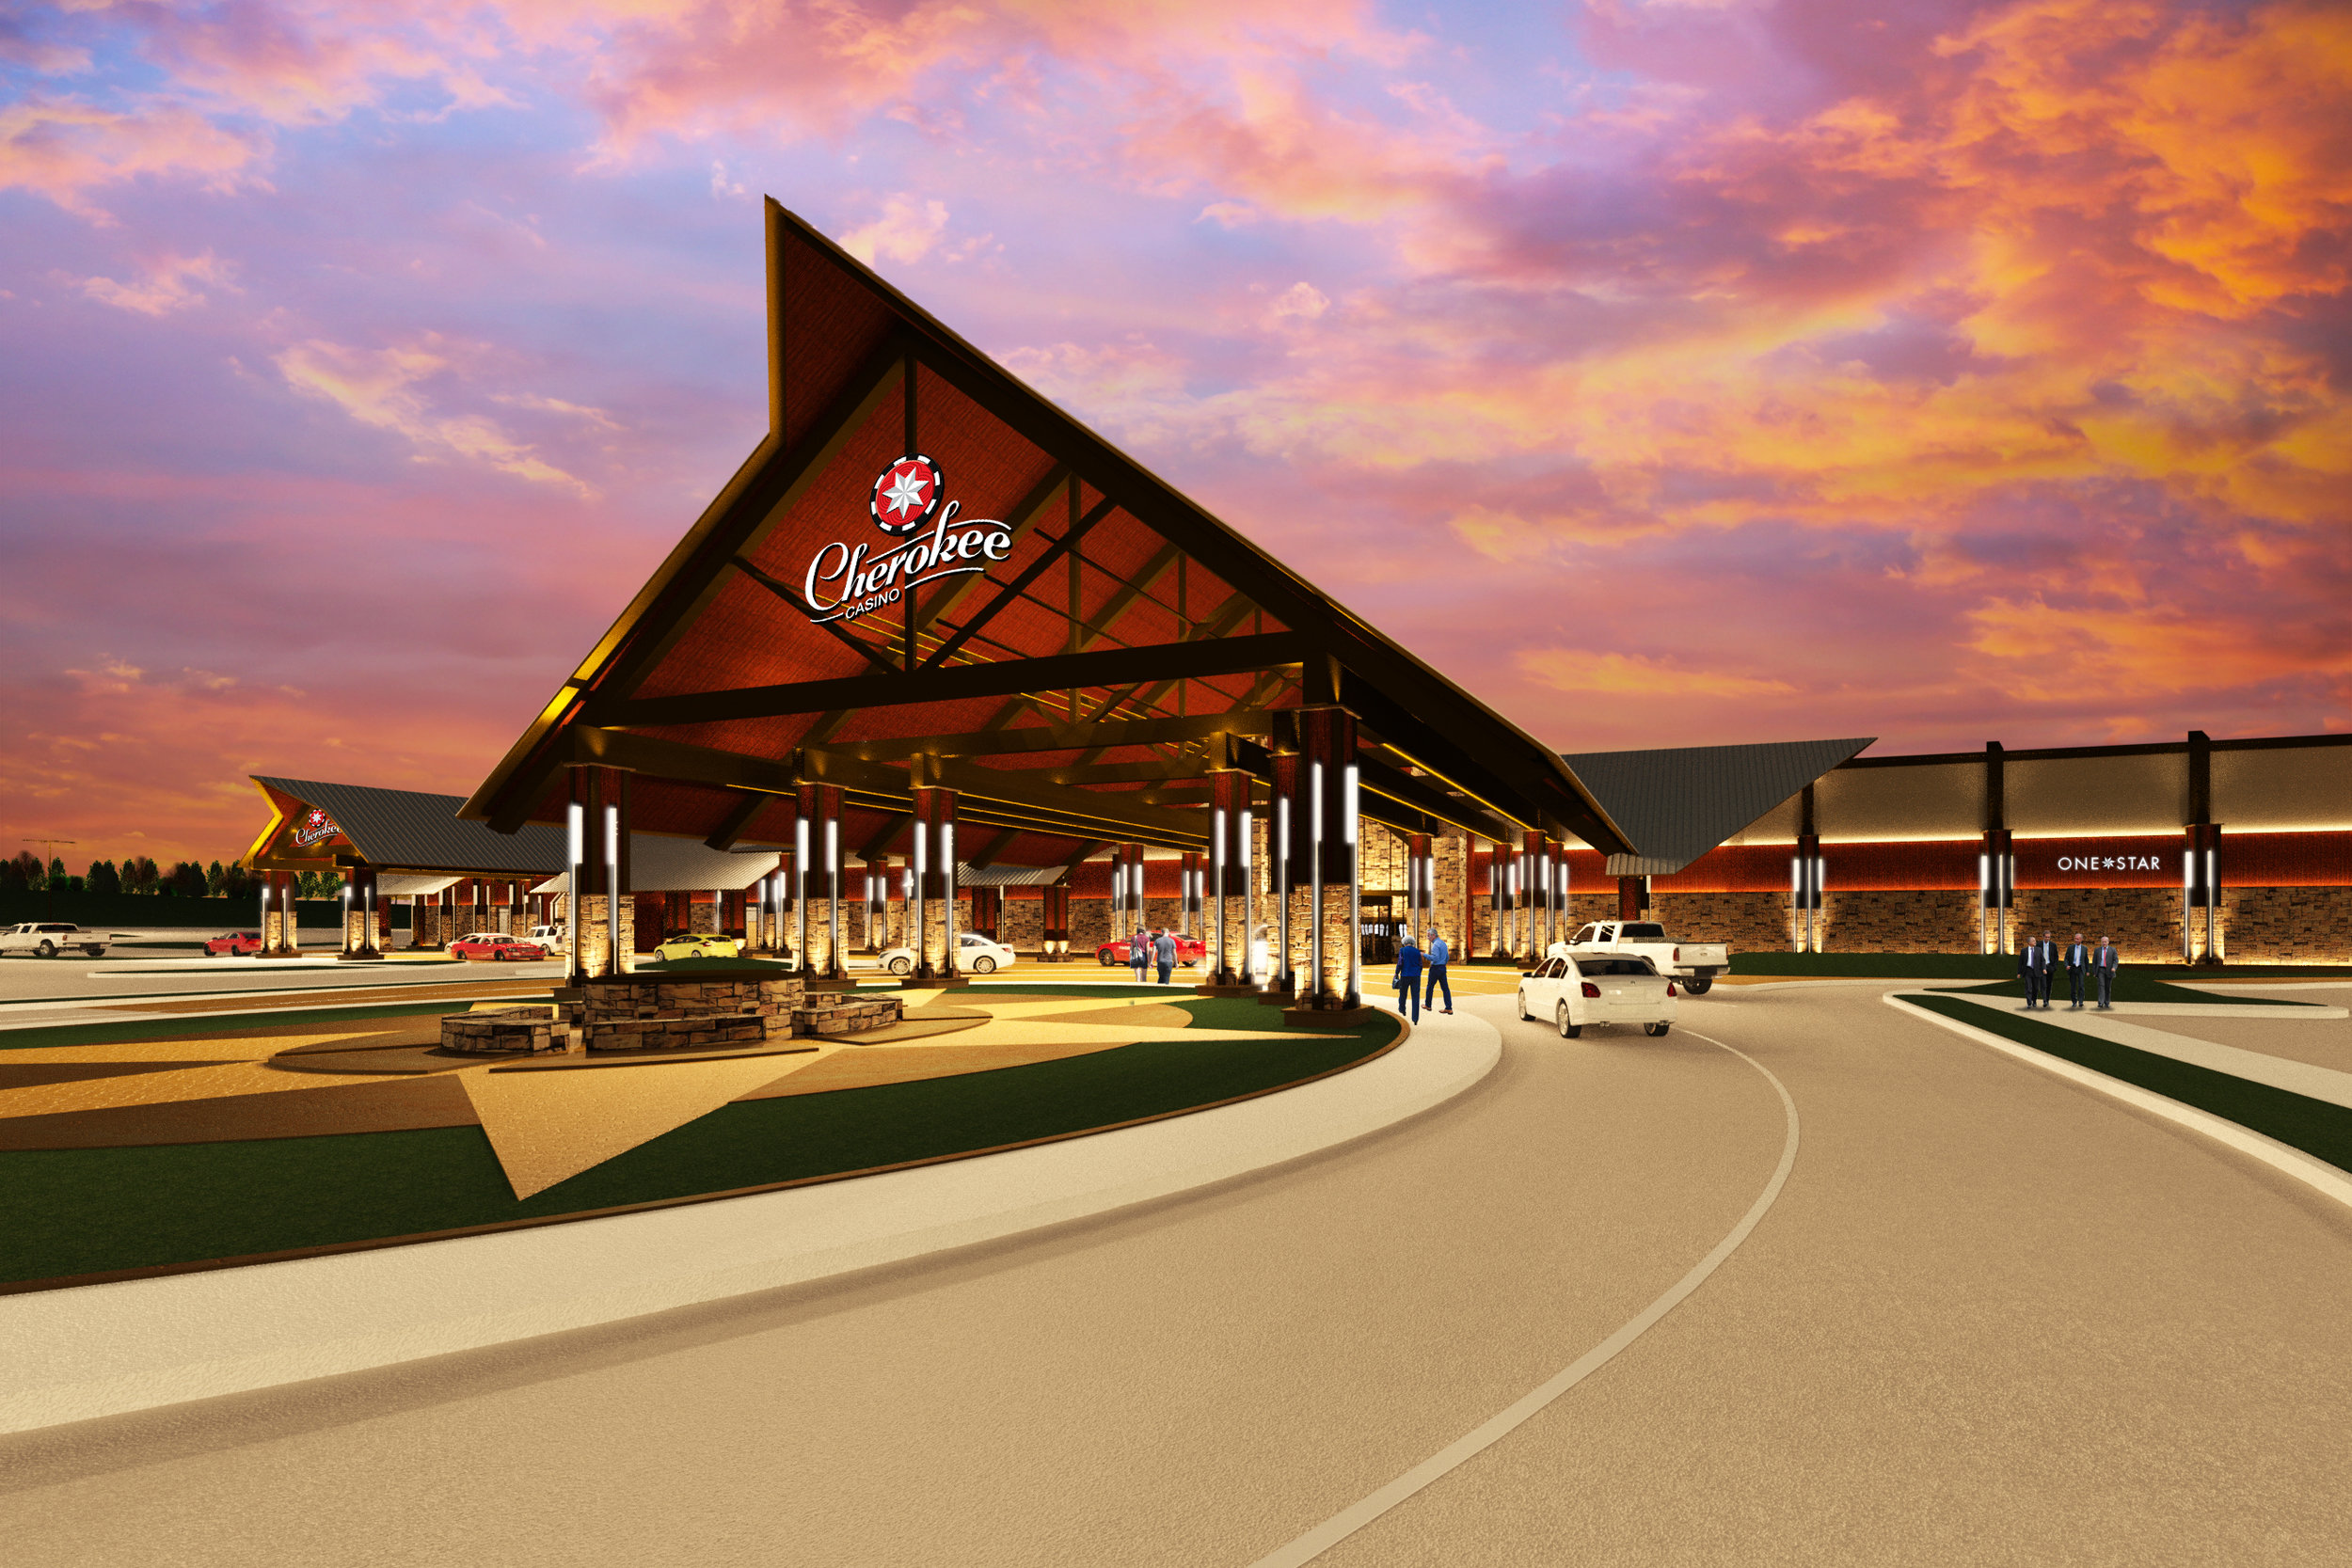 Tahlequah Cherokee Casino Tahlequah, Oklahoma